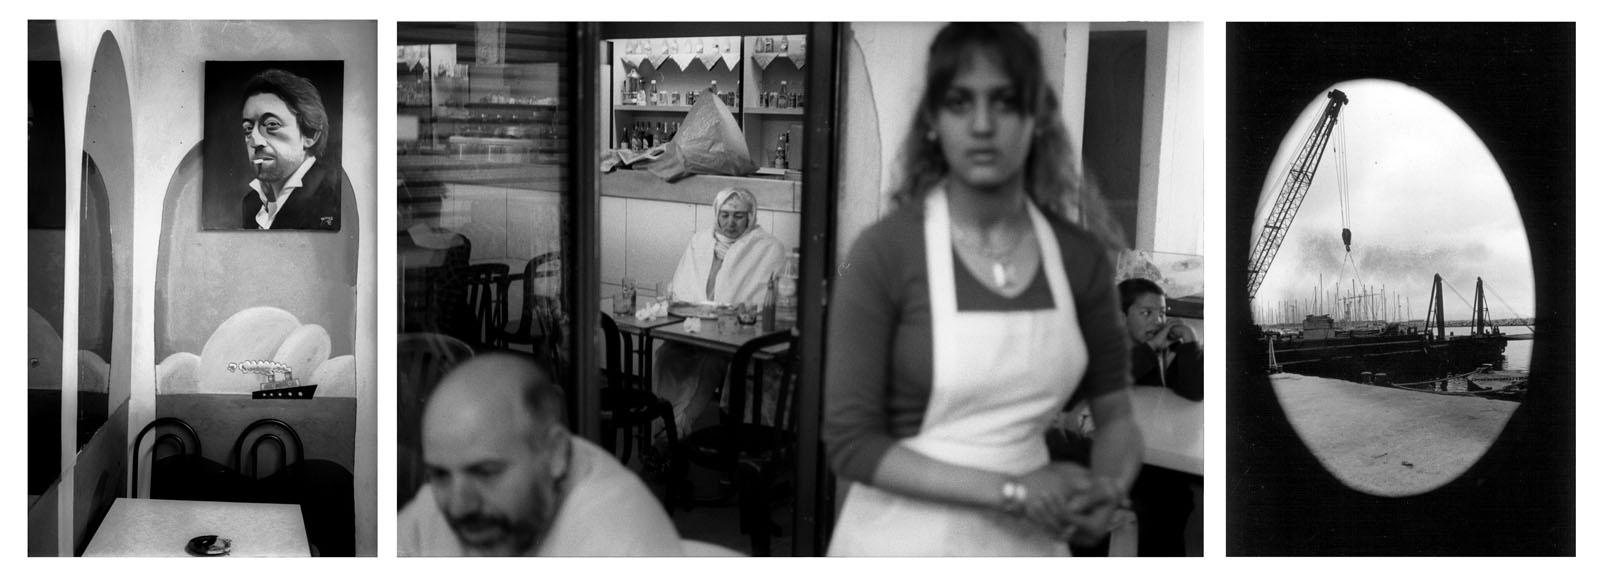 Art and Documentary Photography - Loading 015_Marseille___Fabio_Sgroi.jpg